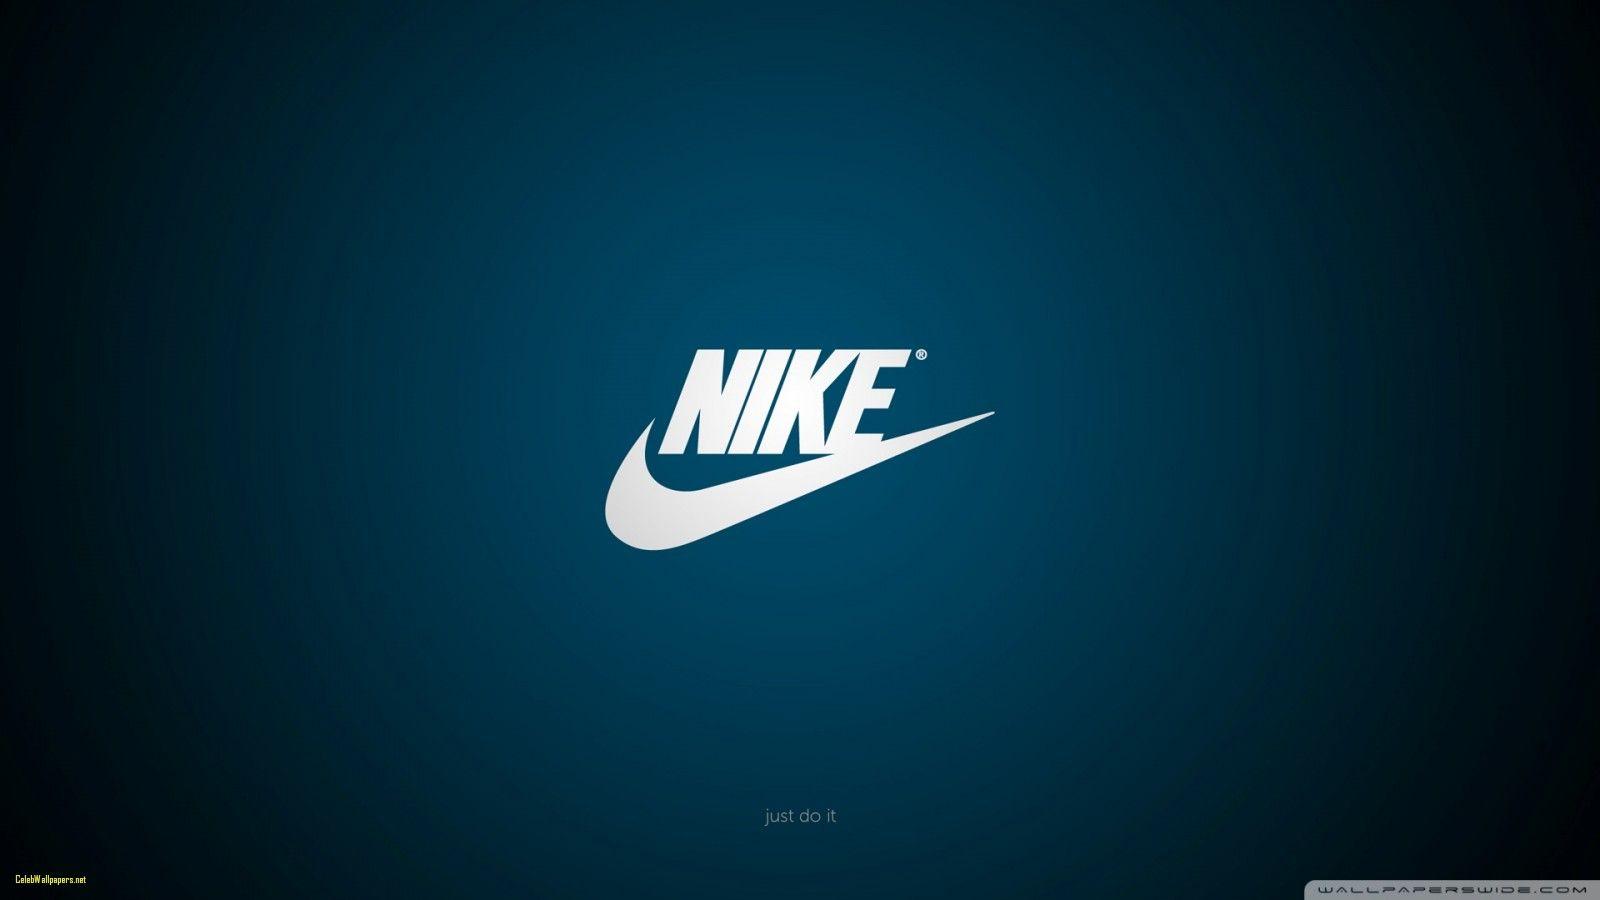 4K Nike Wallpapers   Top 4K Nike Backgrounds   WallpaperAccess 1600x900